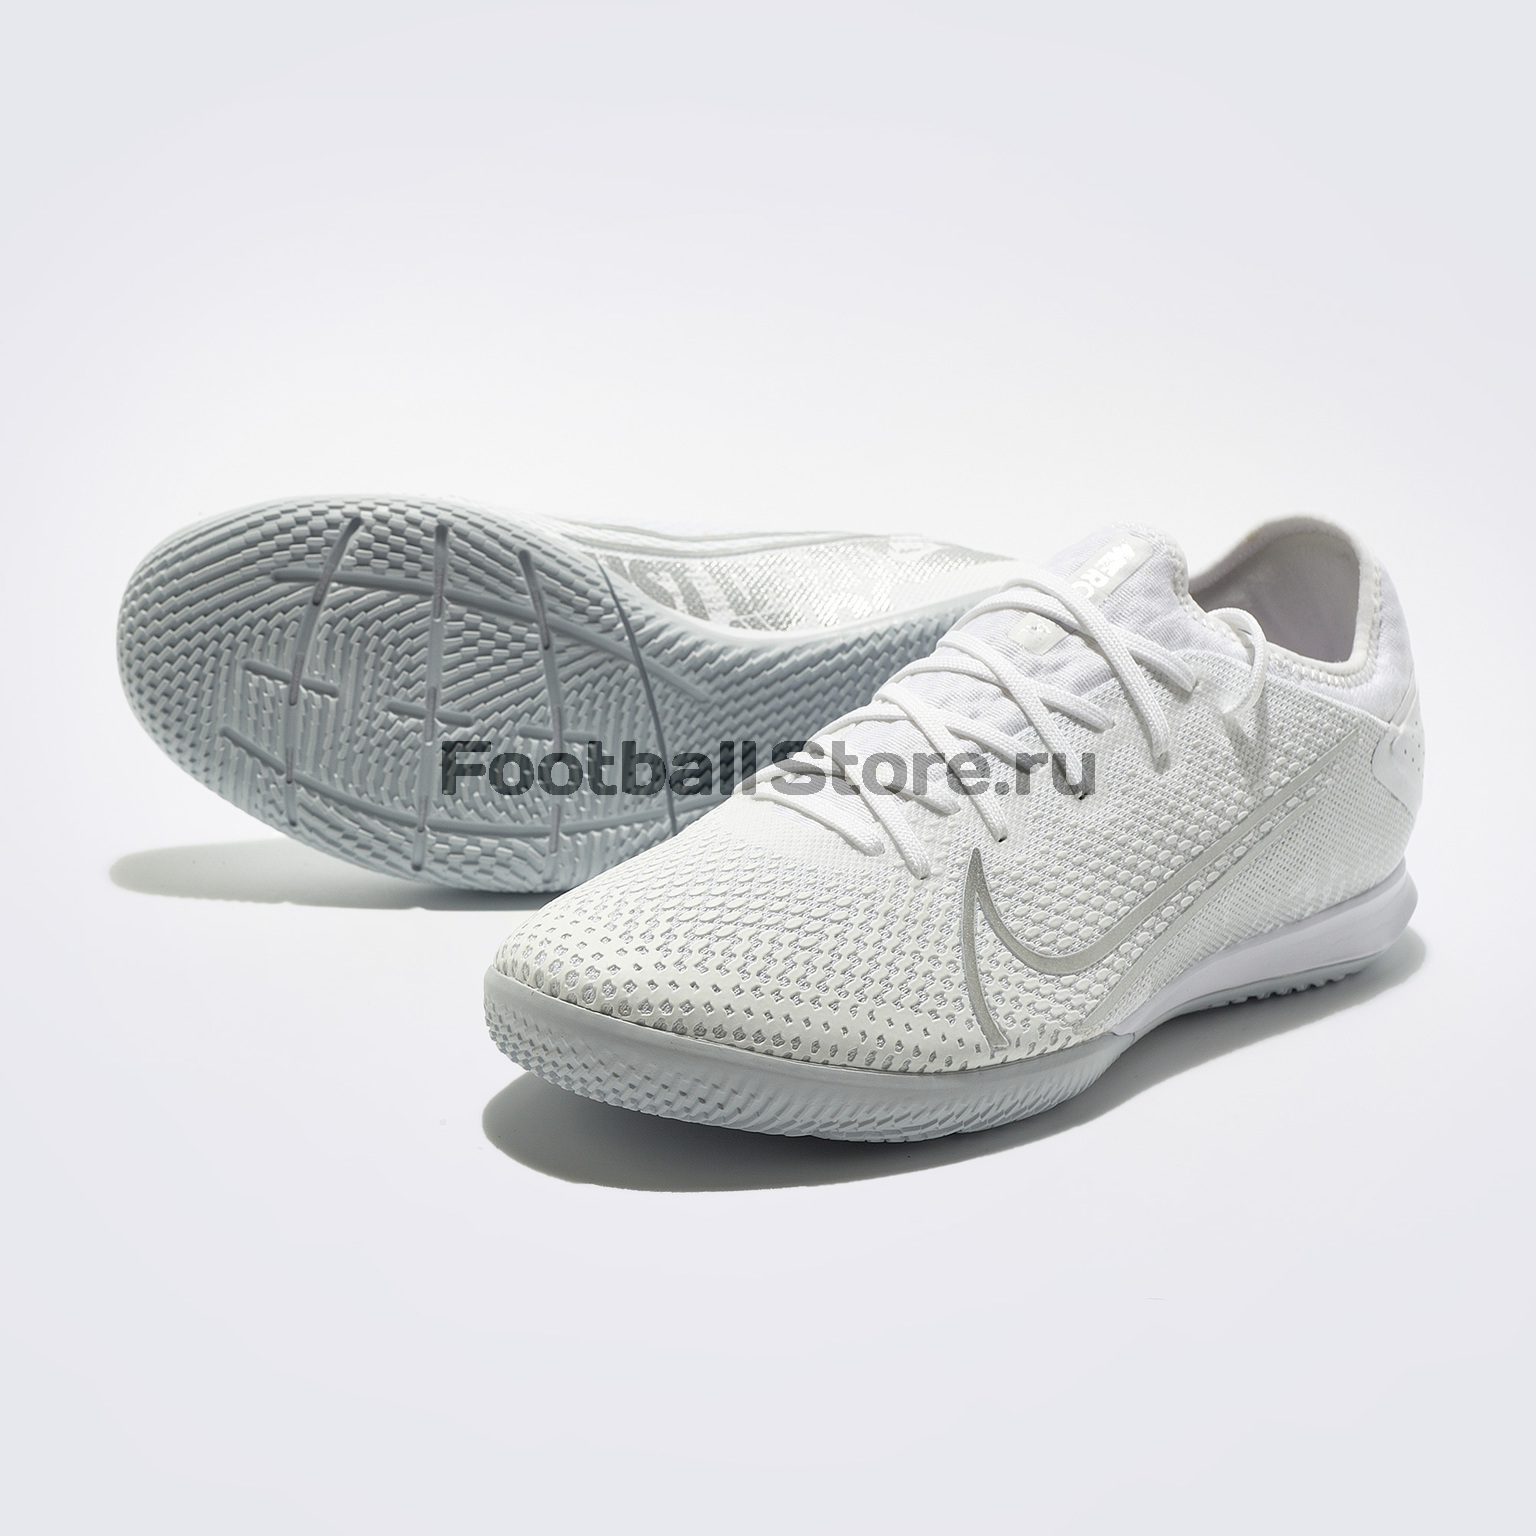 Футзалки Nike Vapor 13 Pro IC AT8001-100